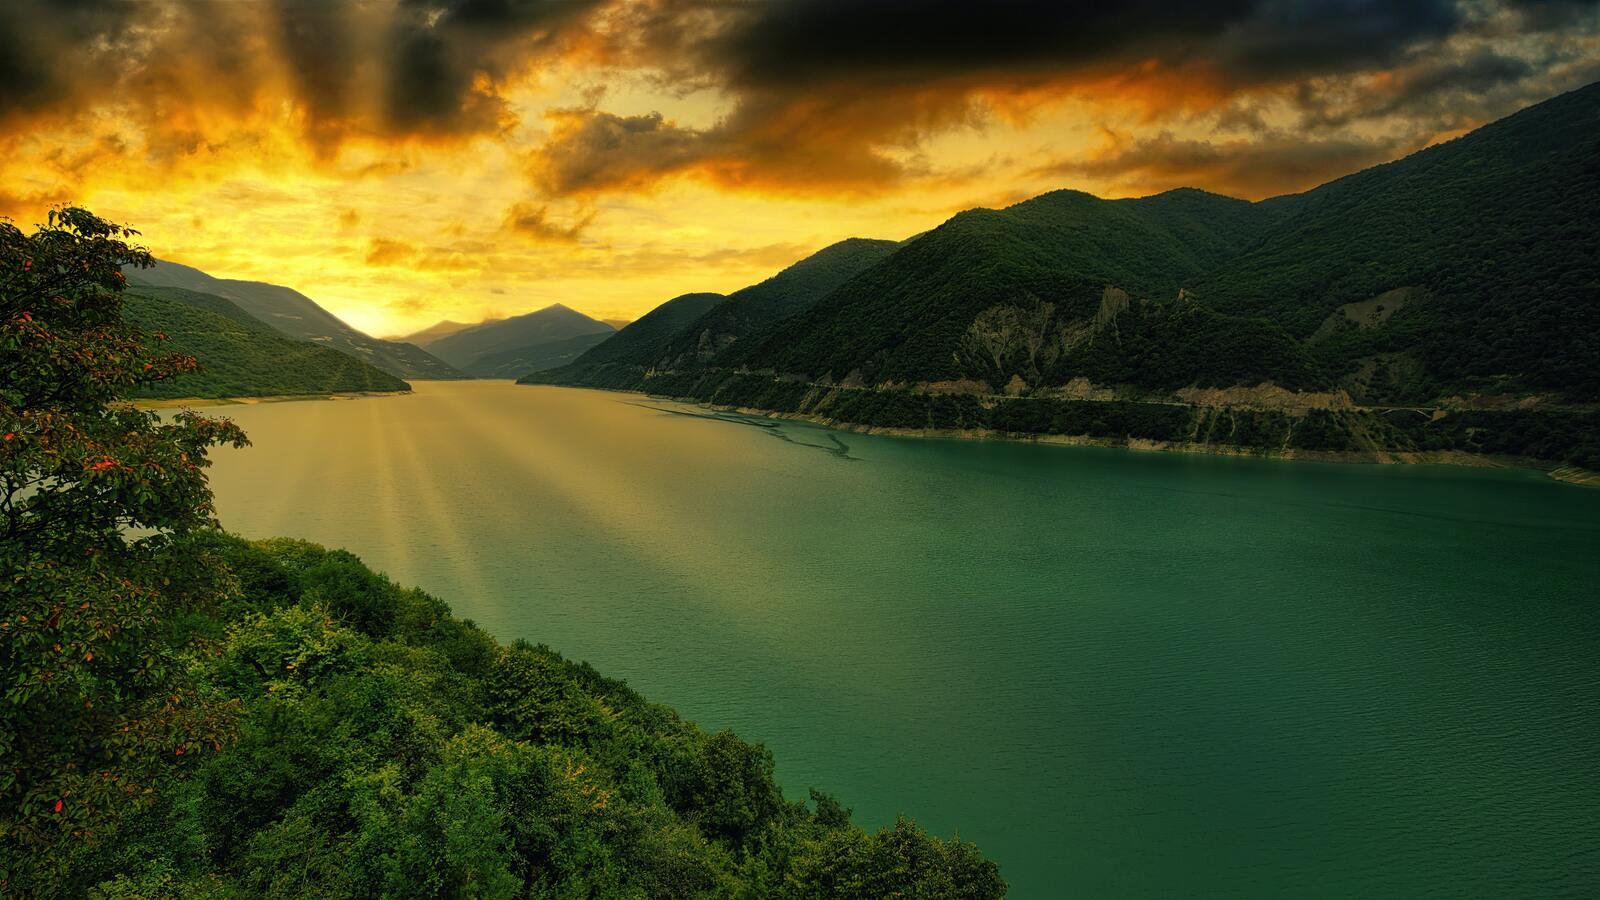 zhinvali-reservoir-georgia-5k-4m.jpg